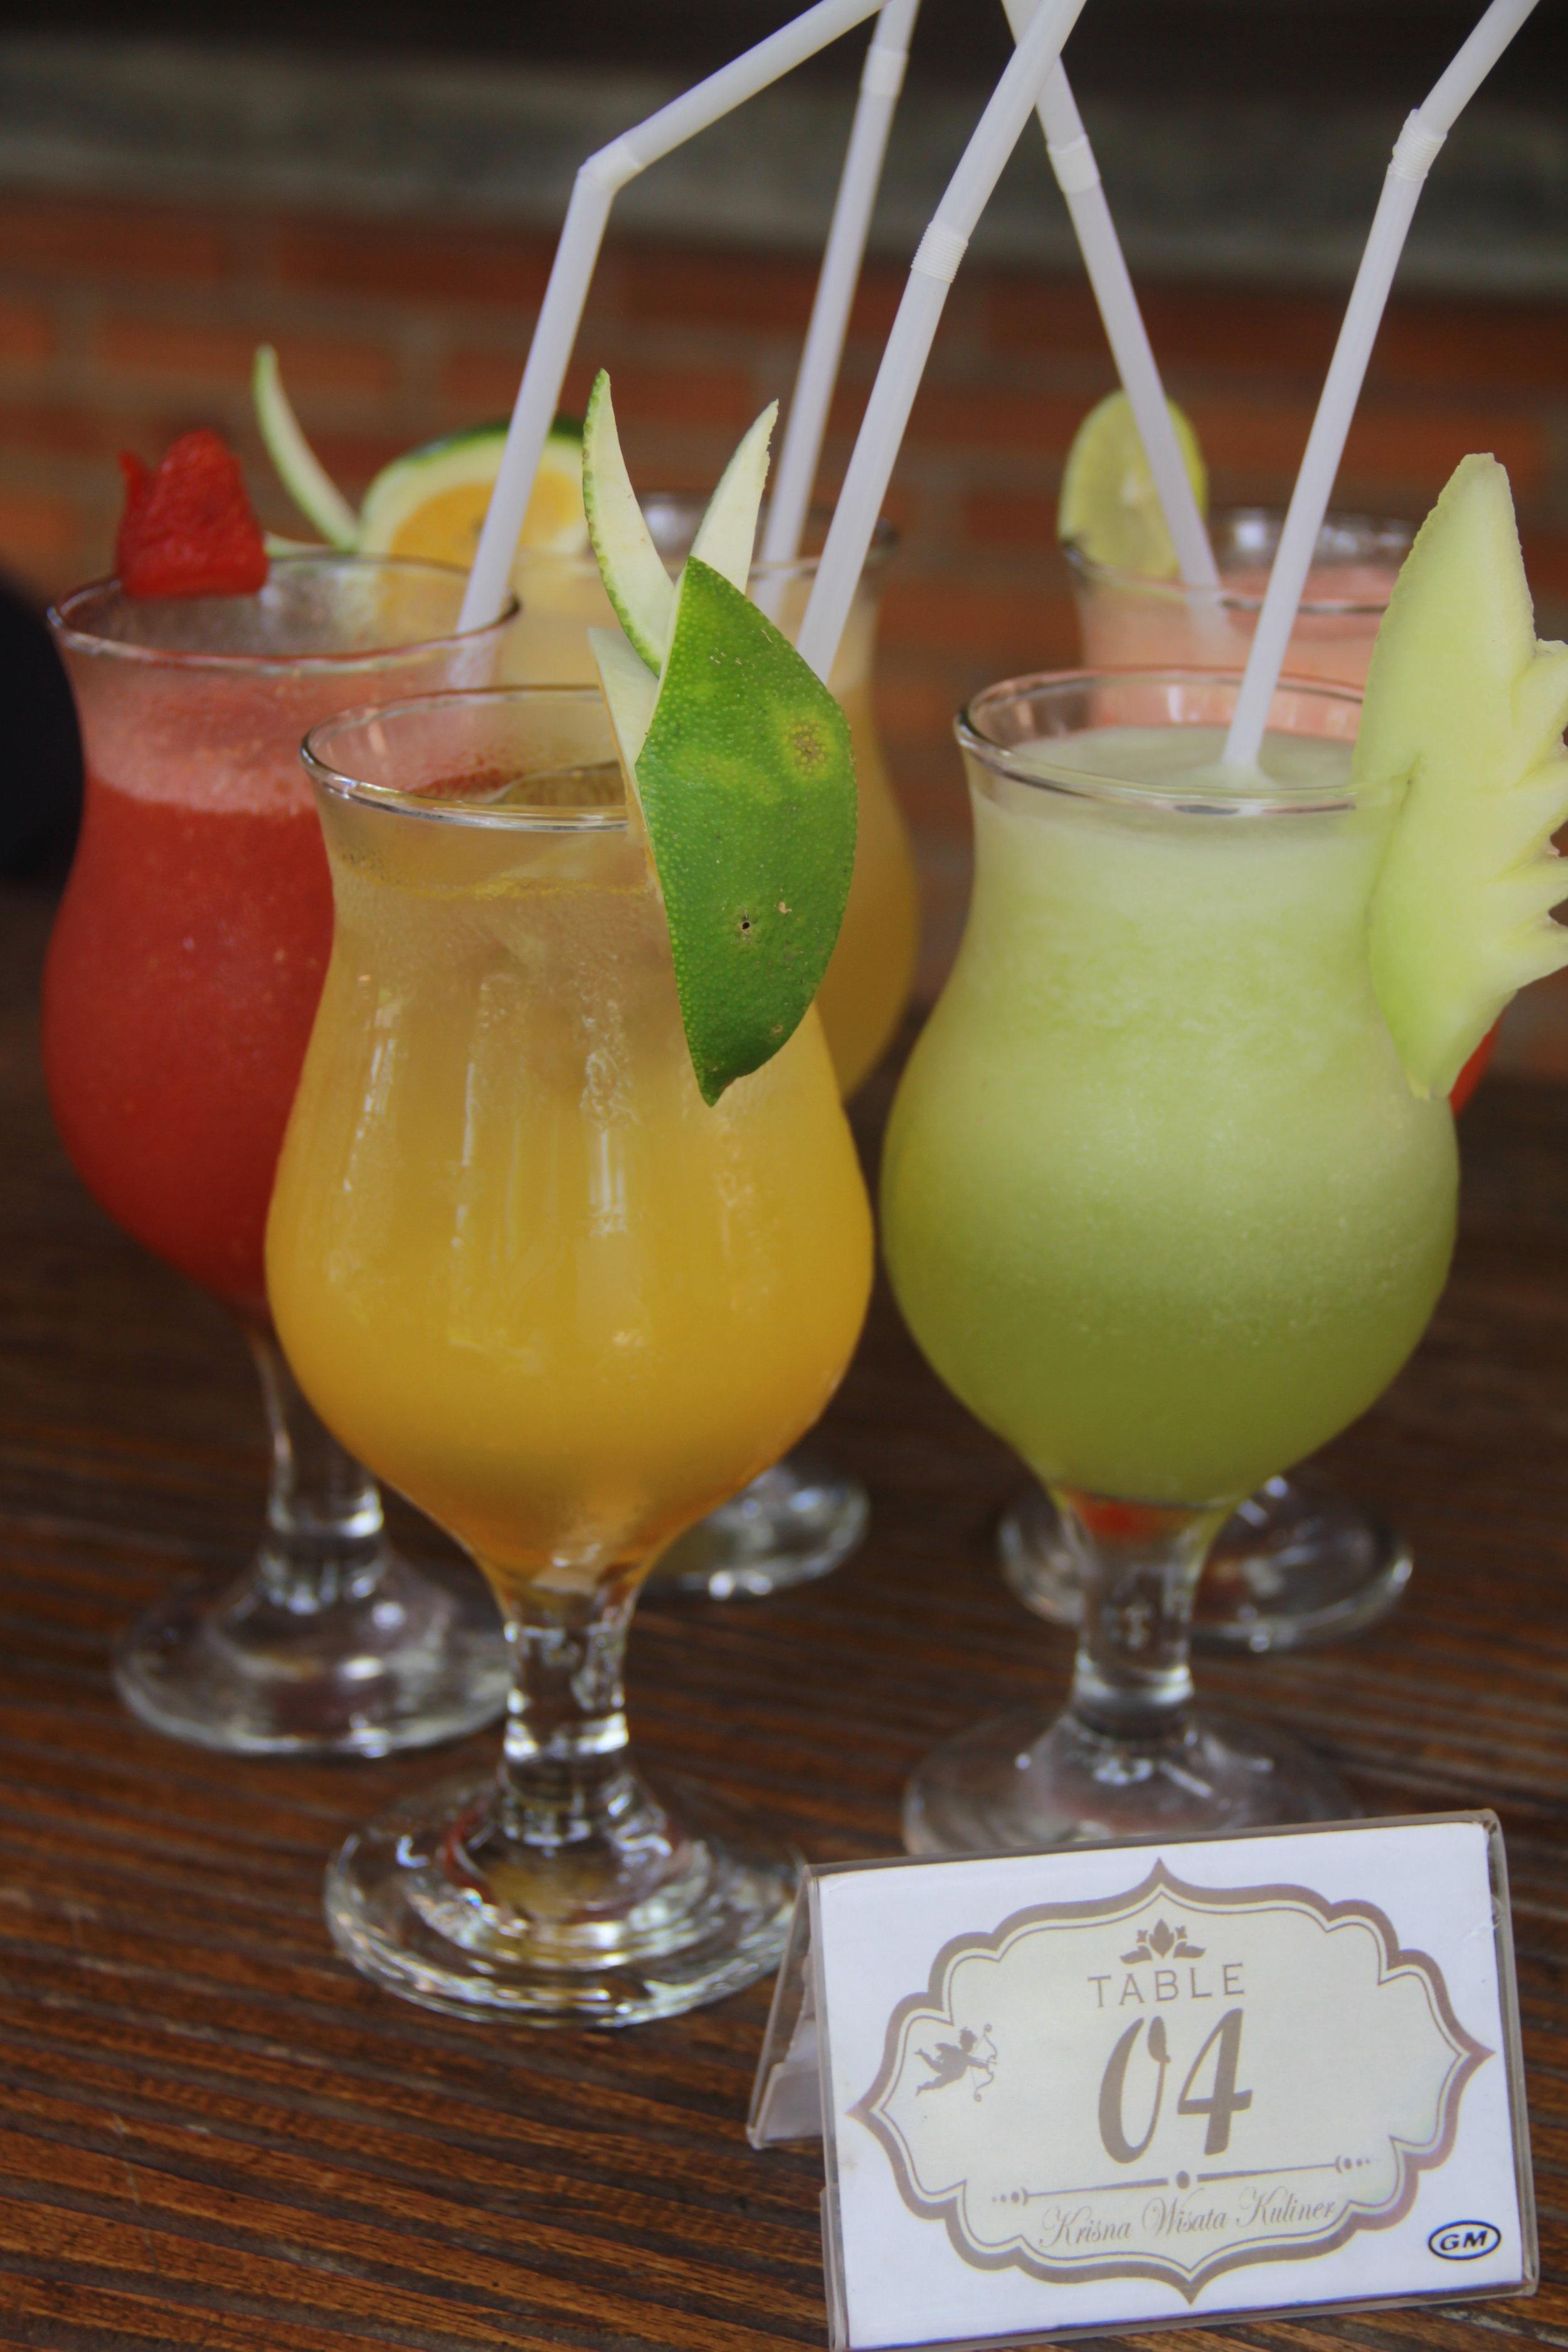 Juice in Bali